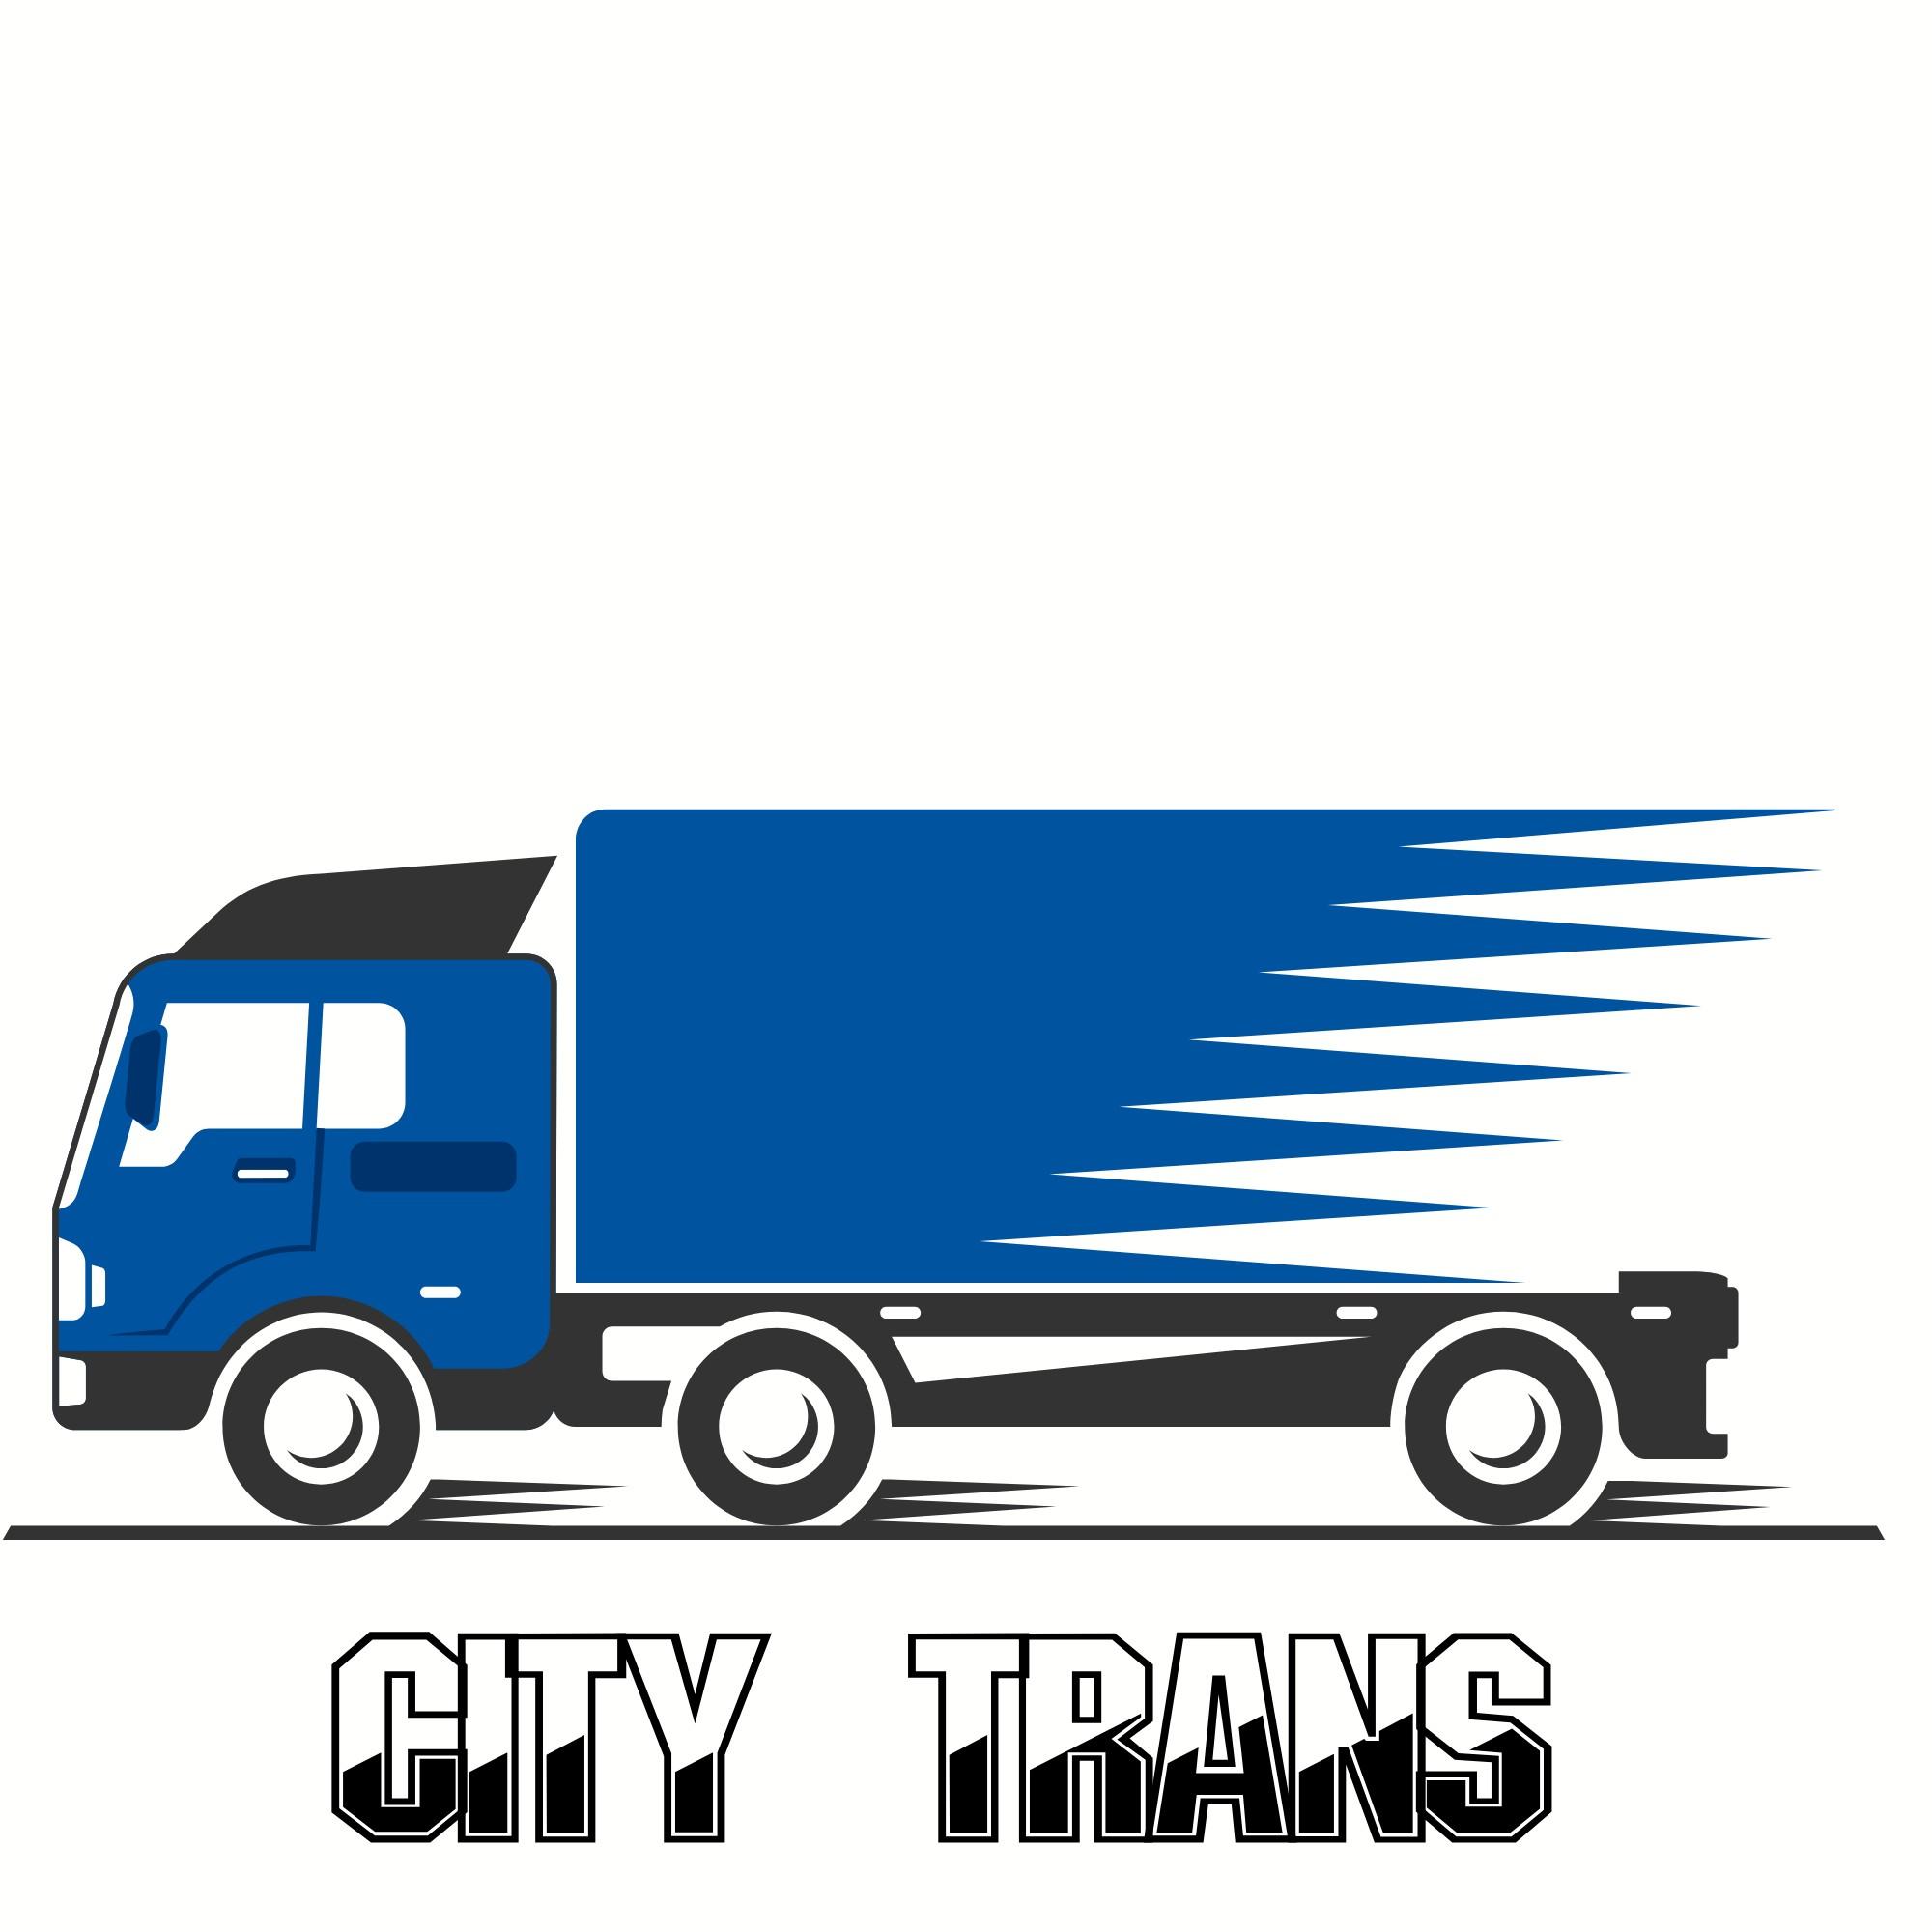 Разработка Логотипа транспортной компании фото f_3185e6ceb1580683.jpg